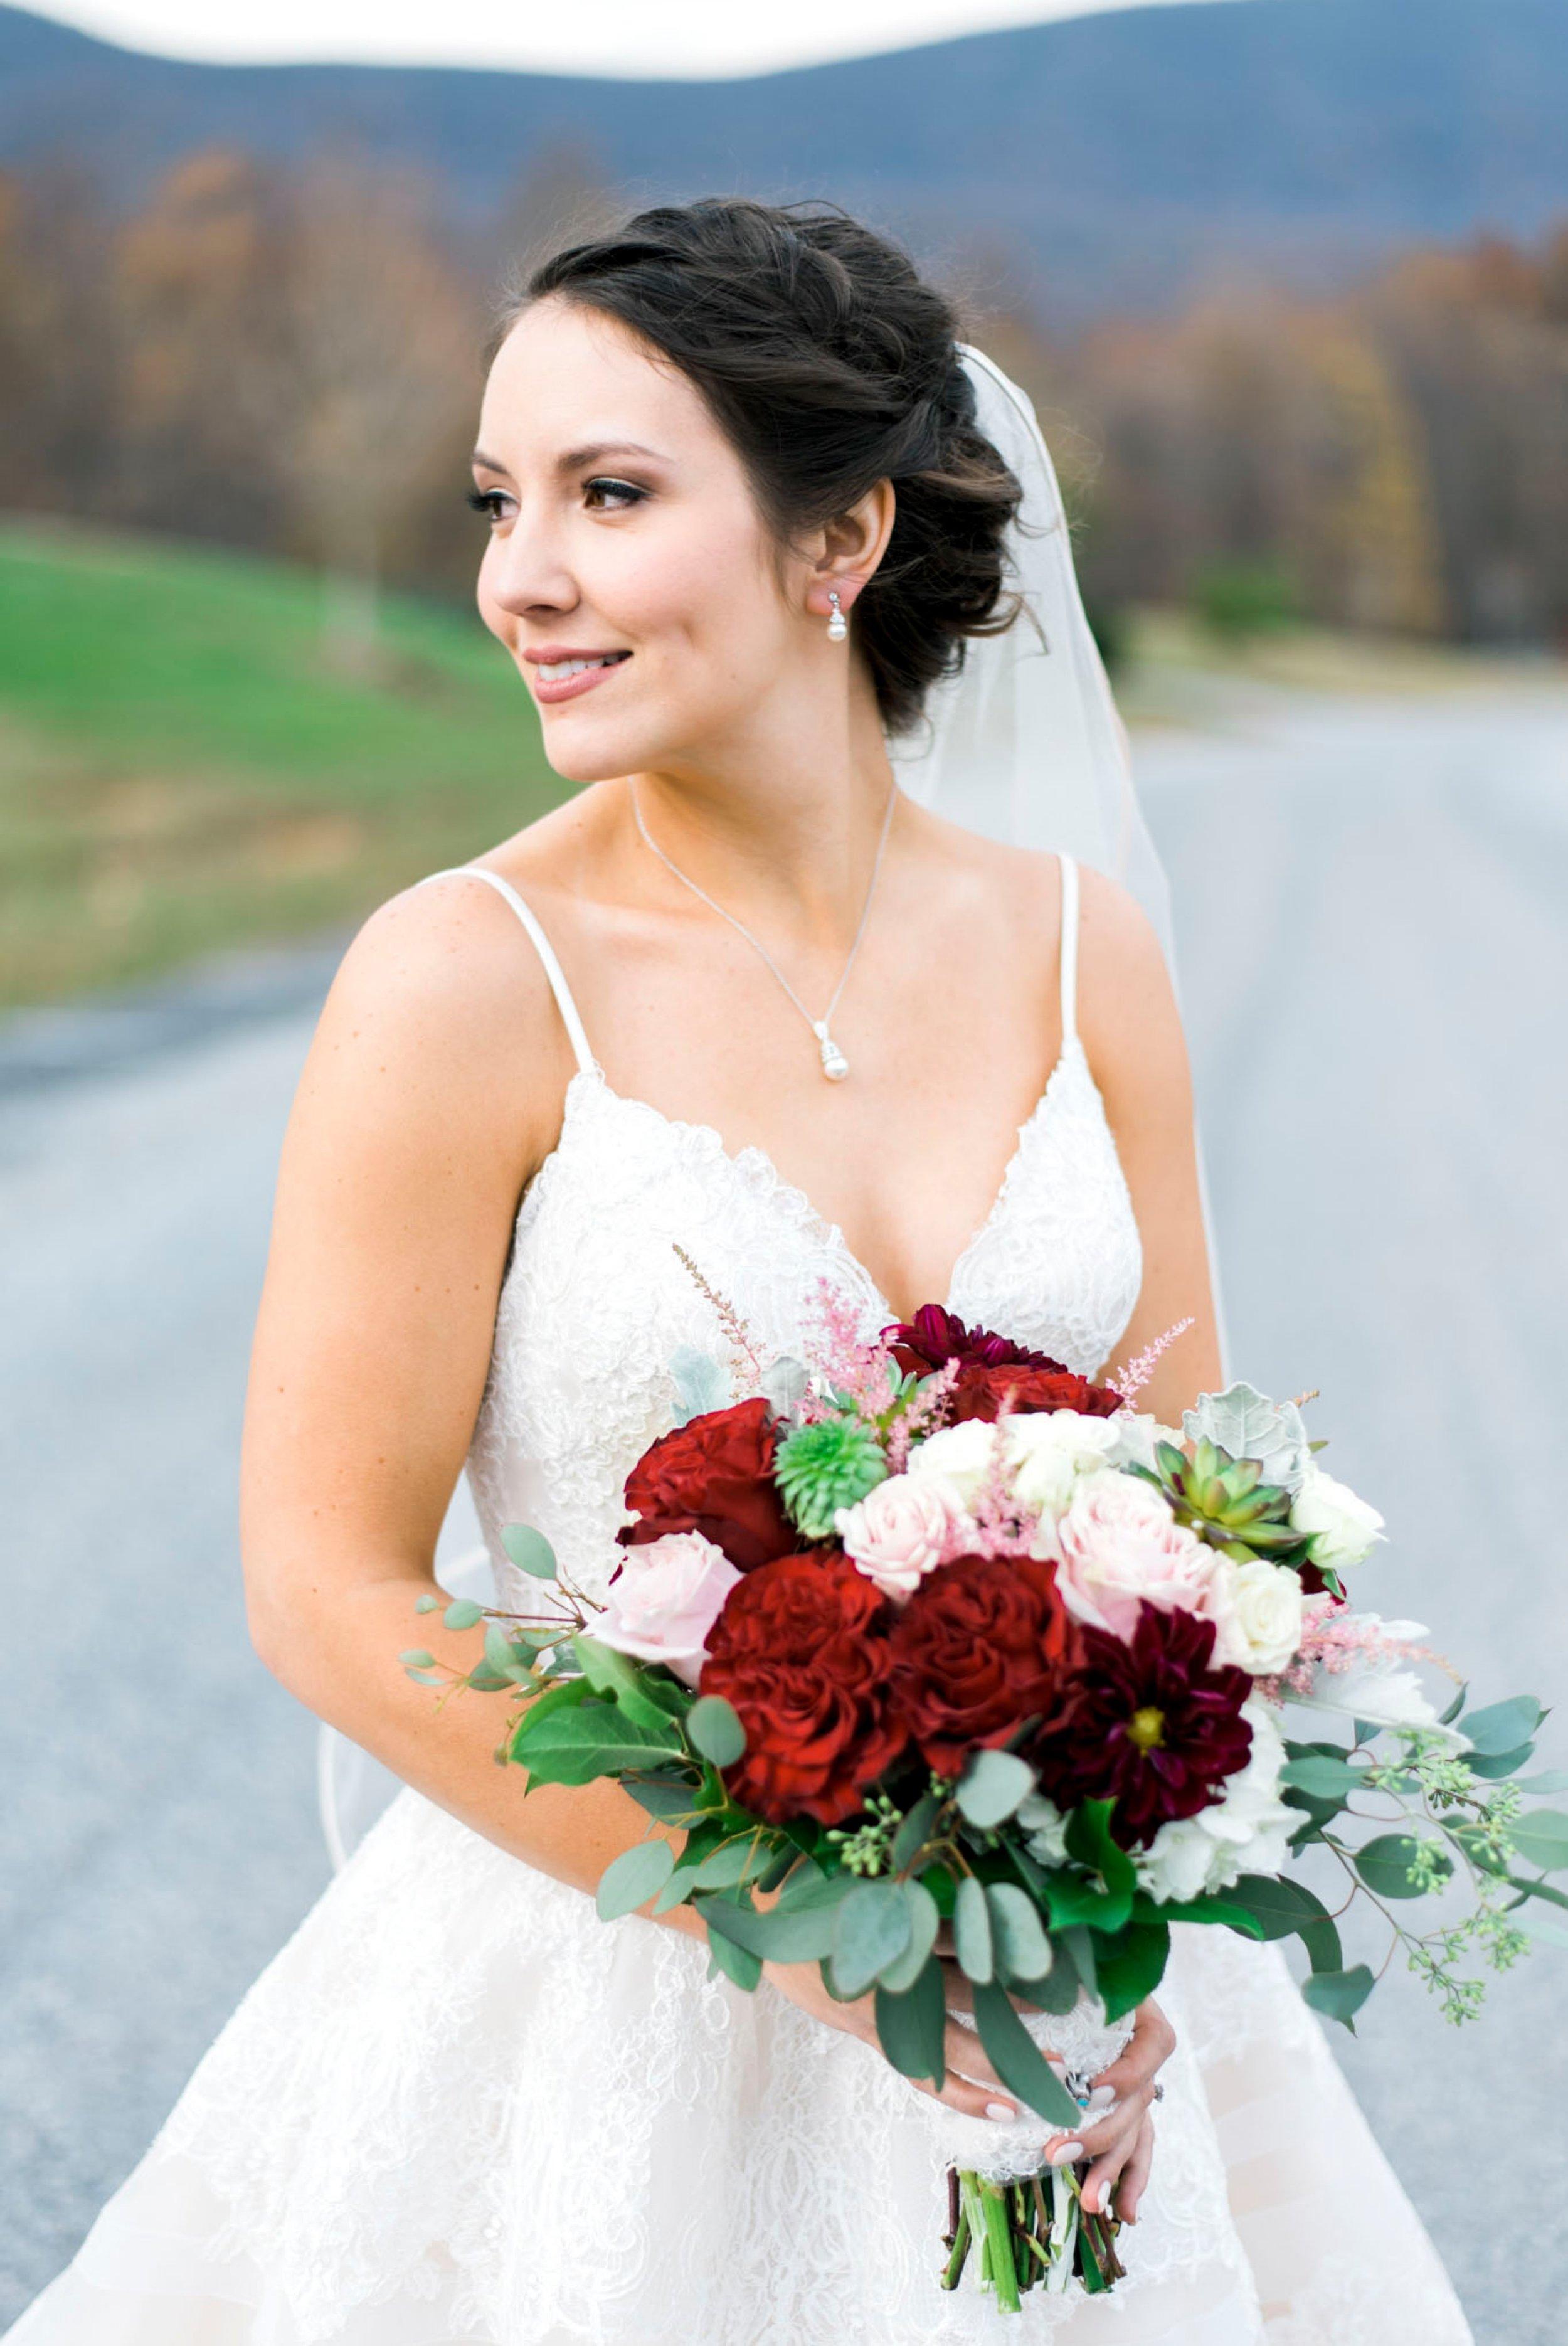 IrvineEstate_LexingtonVA_Wedding_FallWedding_VirginiaWeddingPhotographer 45.jpg